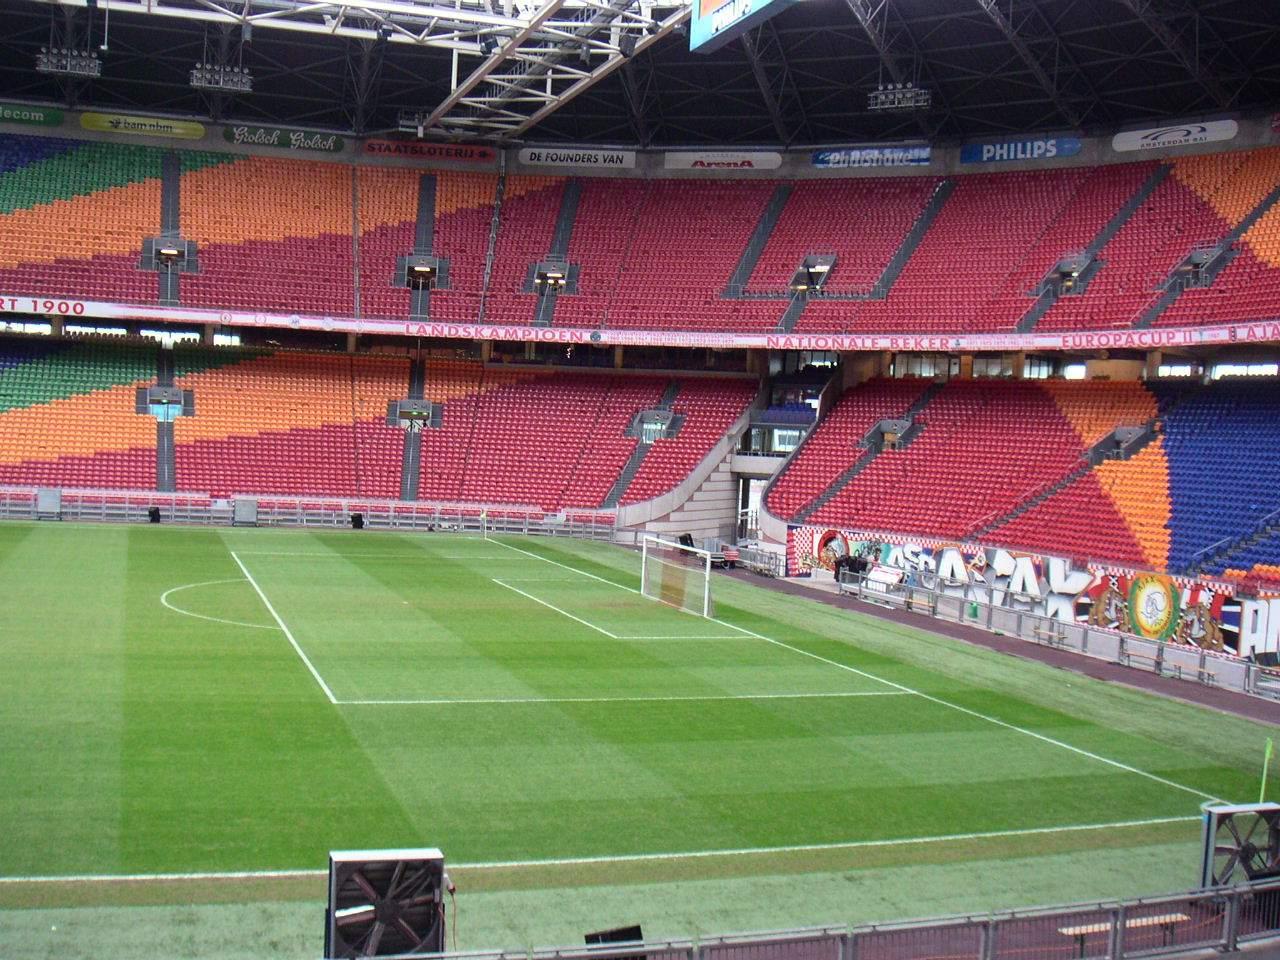 amsterdam arena (22)